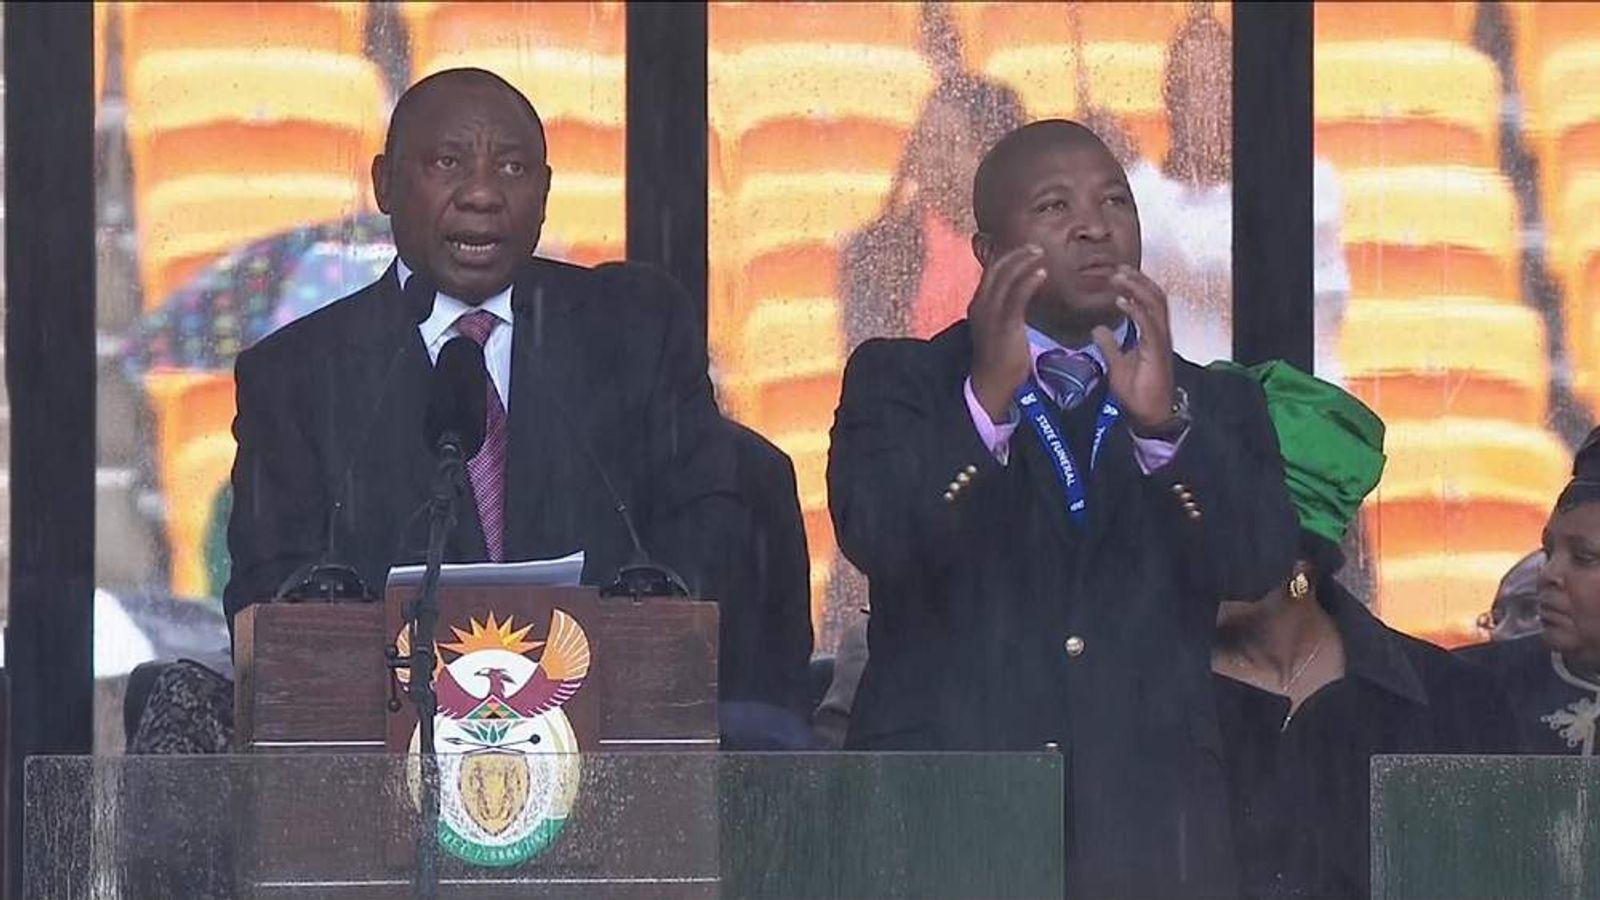 Man accused of being fake interpreter at Mandela memorial